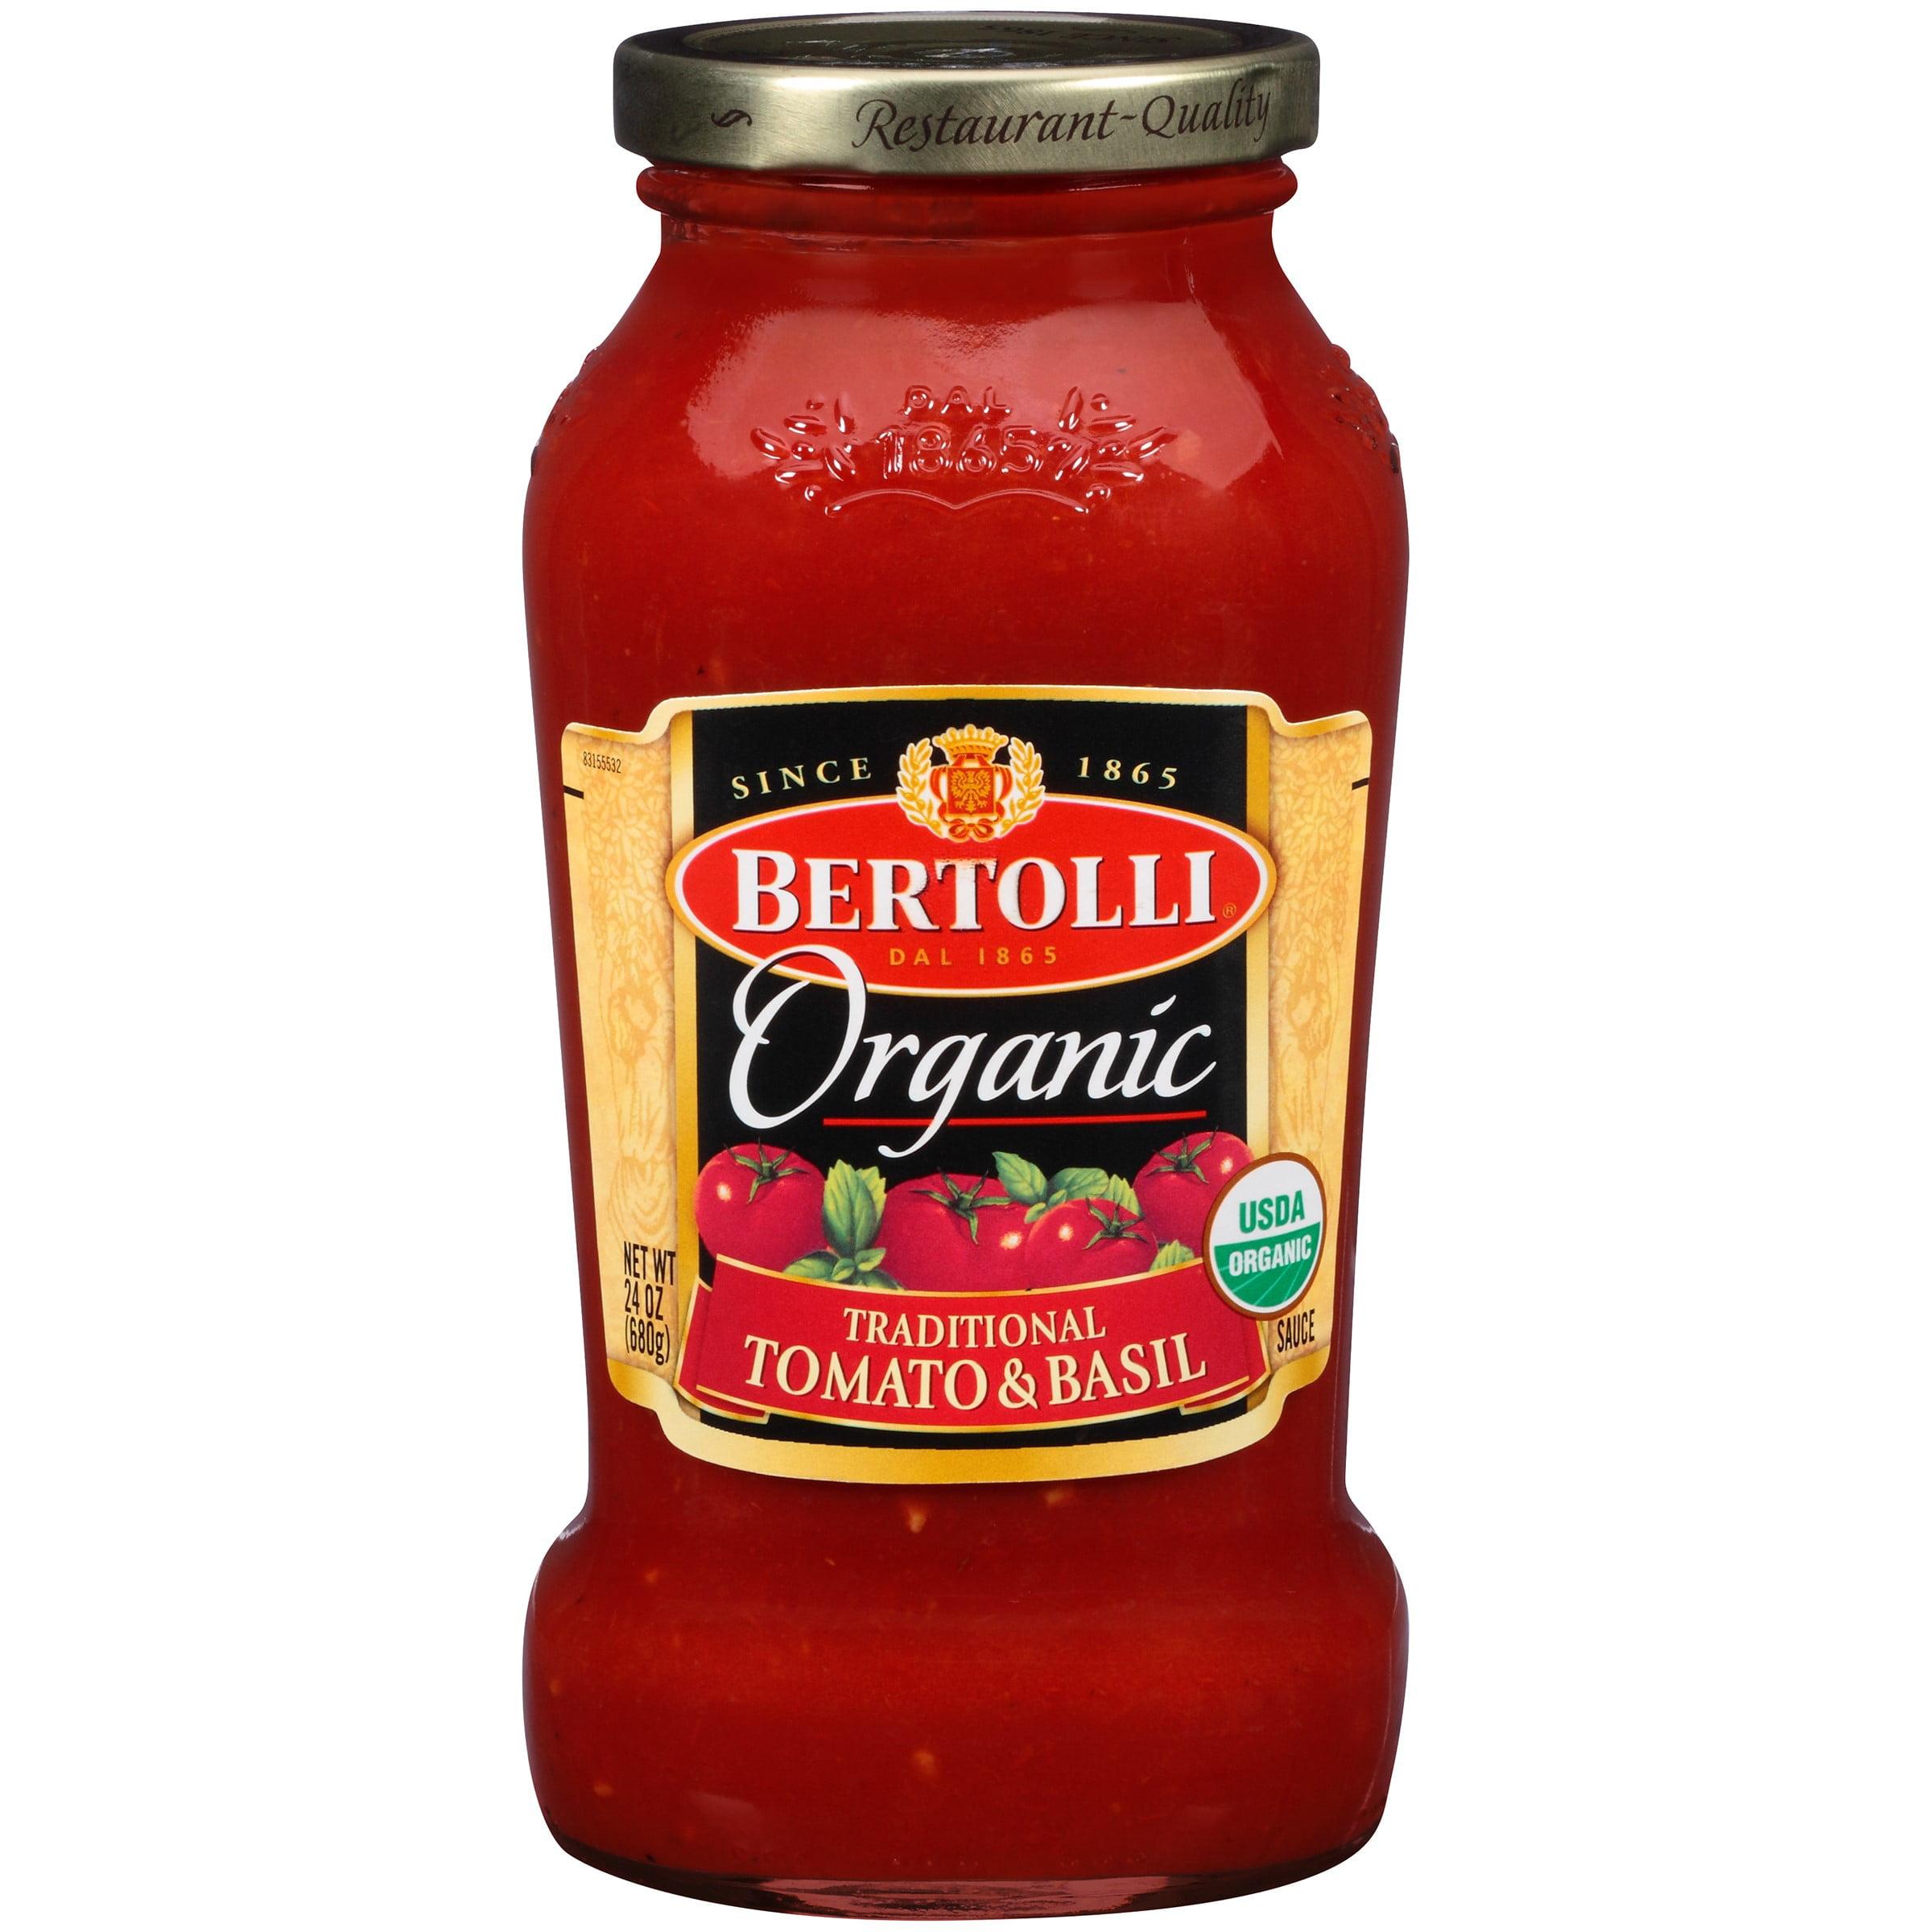 Bertolli Organic Traditional Tomato & Basil Pasta Sauce 24 oz.